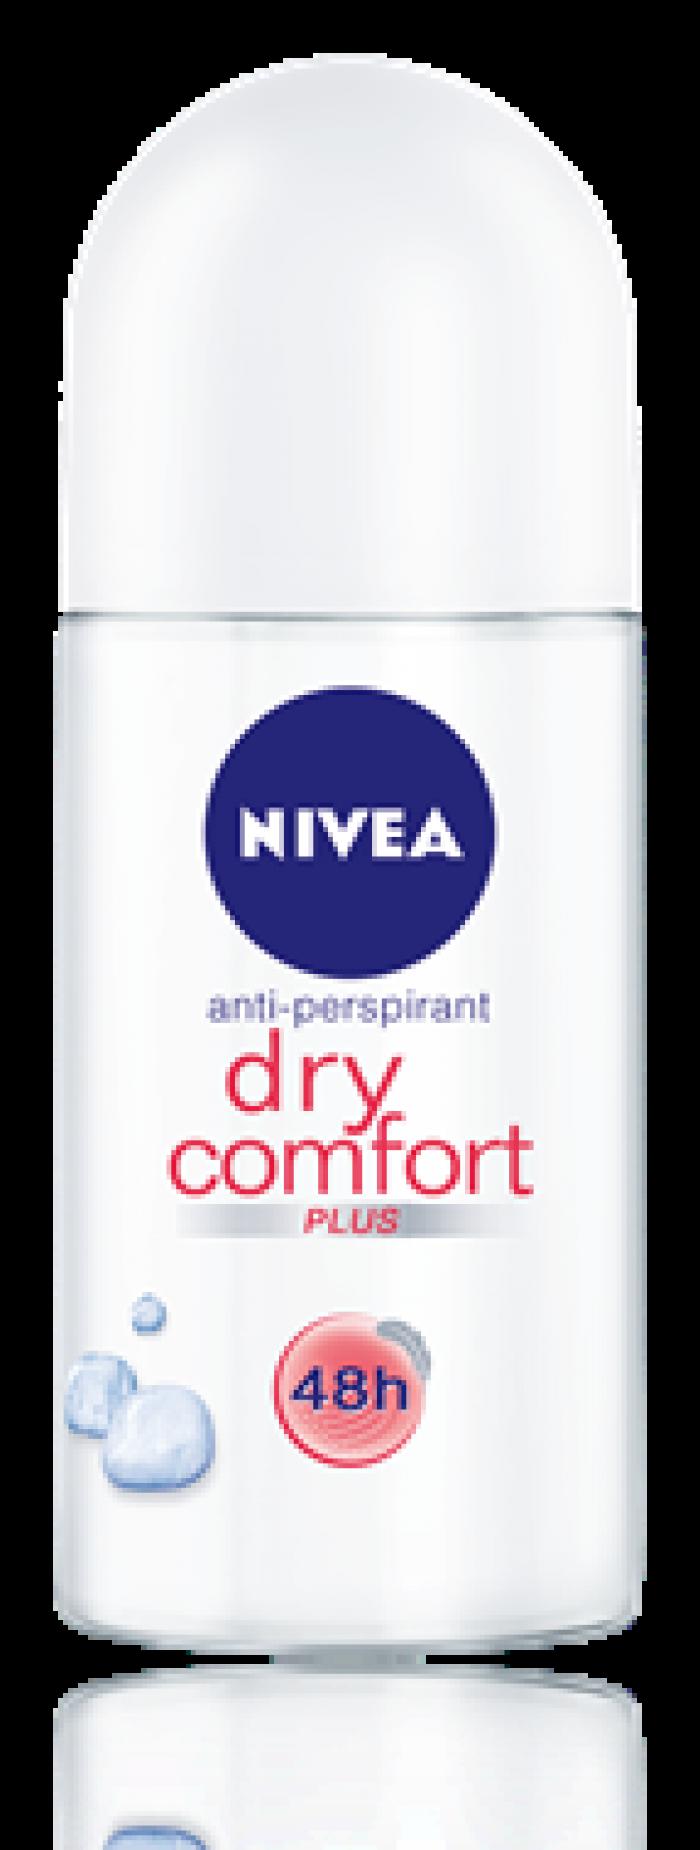 رول ضد تعریق زنانه نیوآ مدل Dry Comfort حجم 50 میلی لیتر